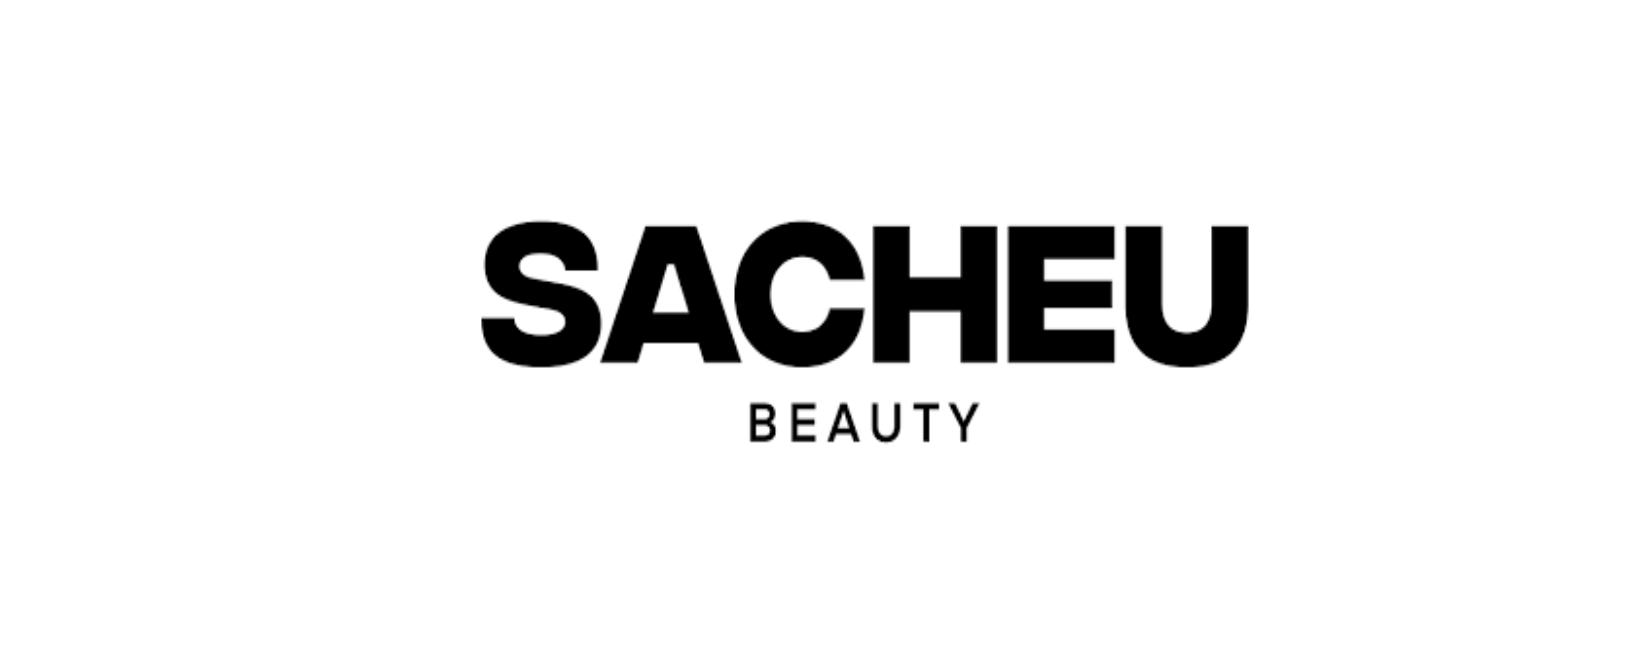 SACHEU Beauty Discount Code 2021